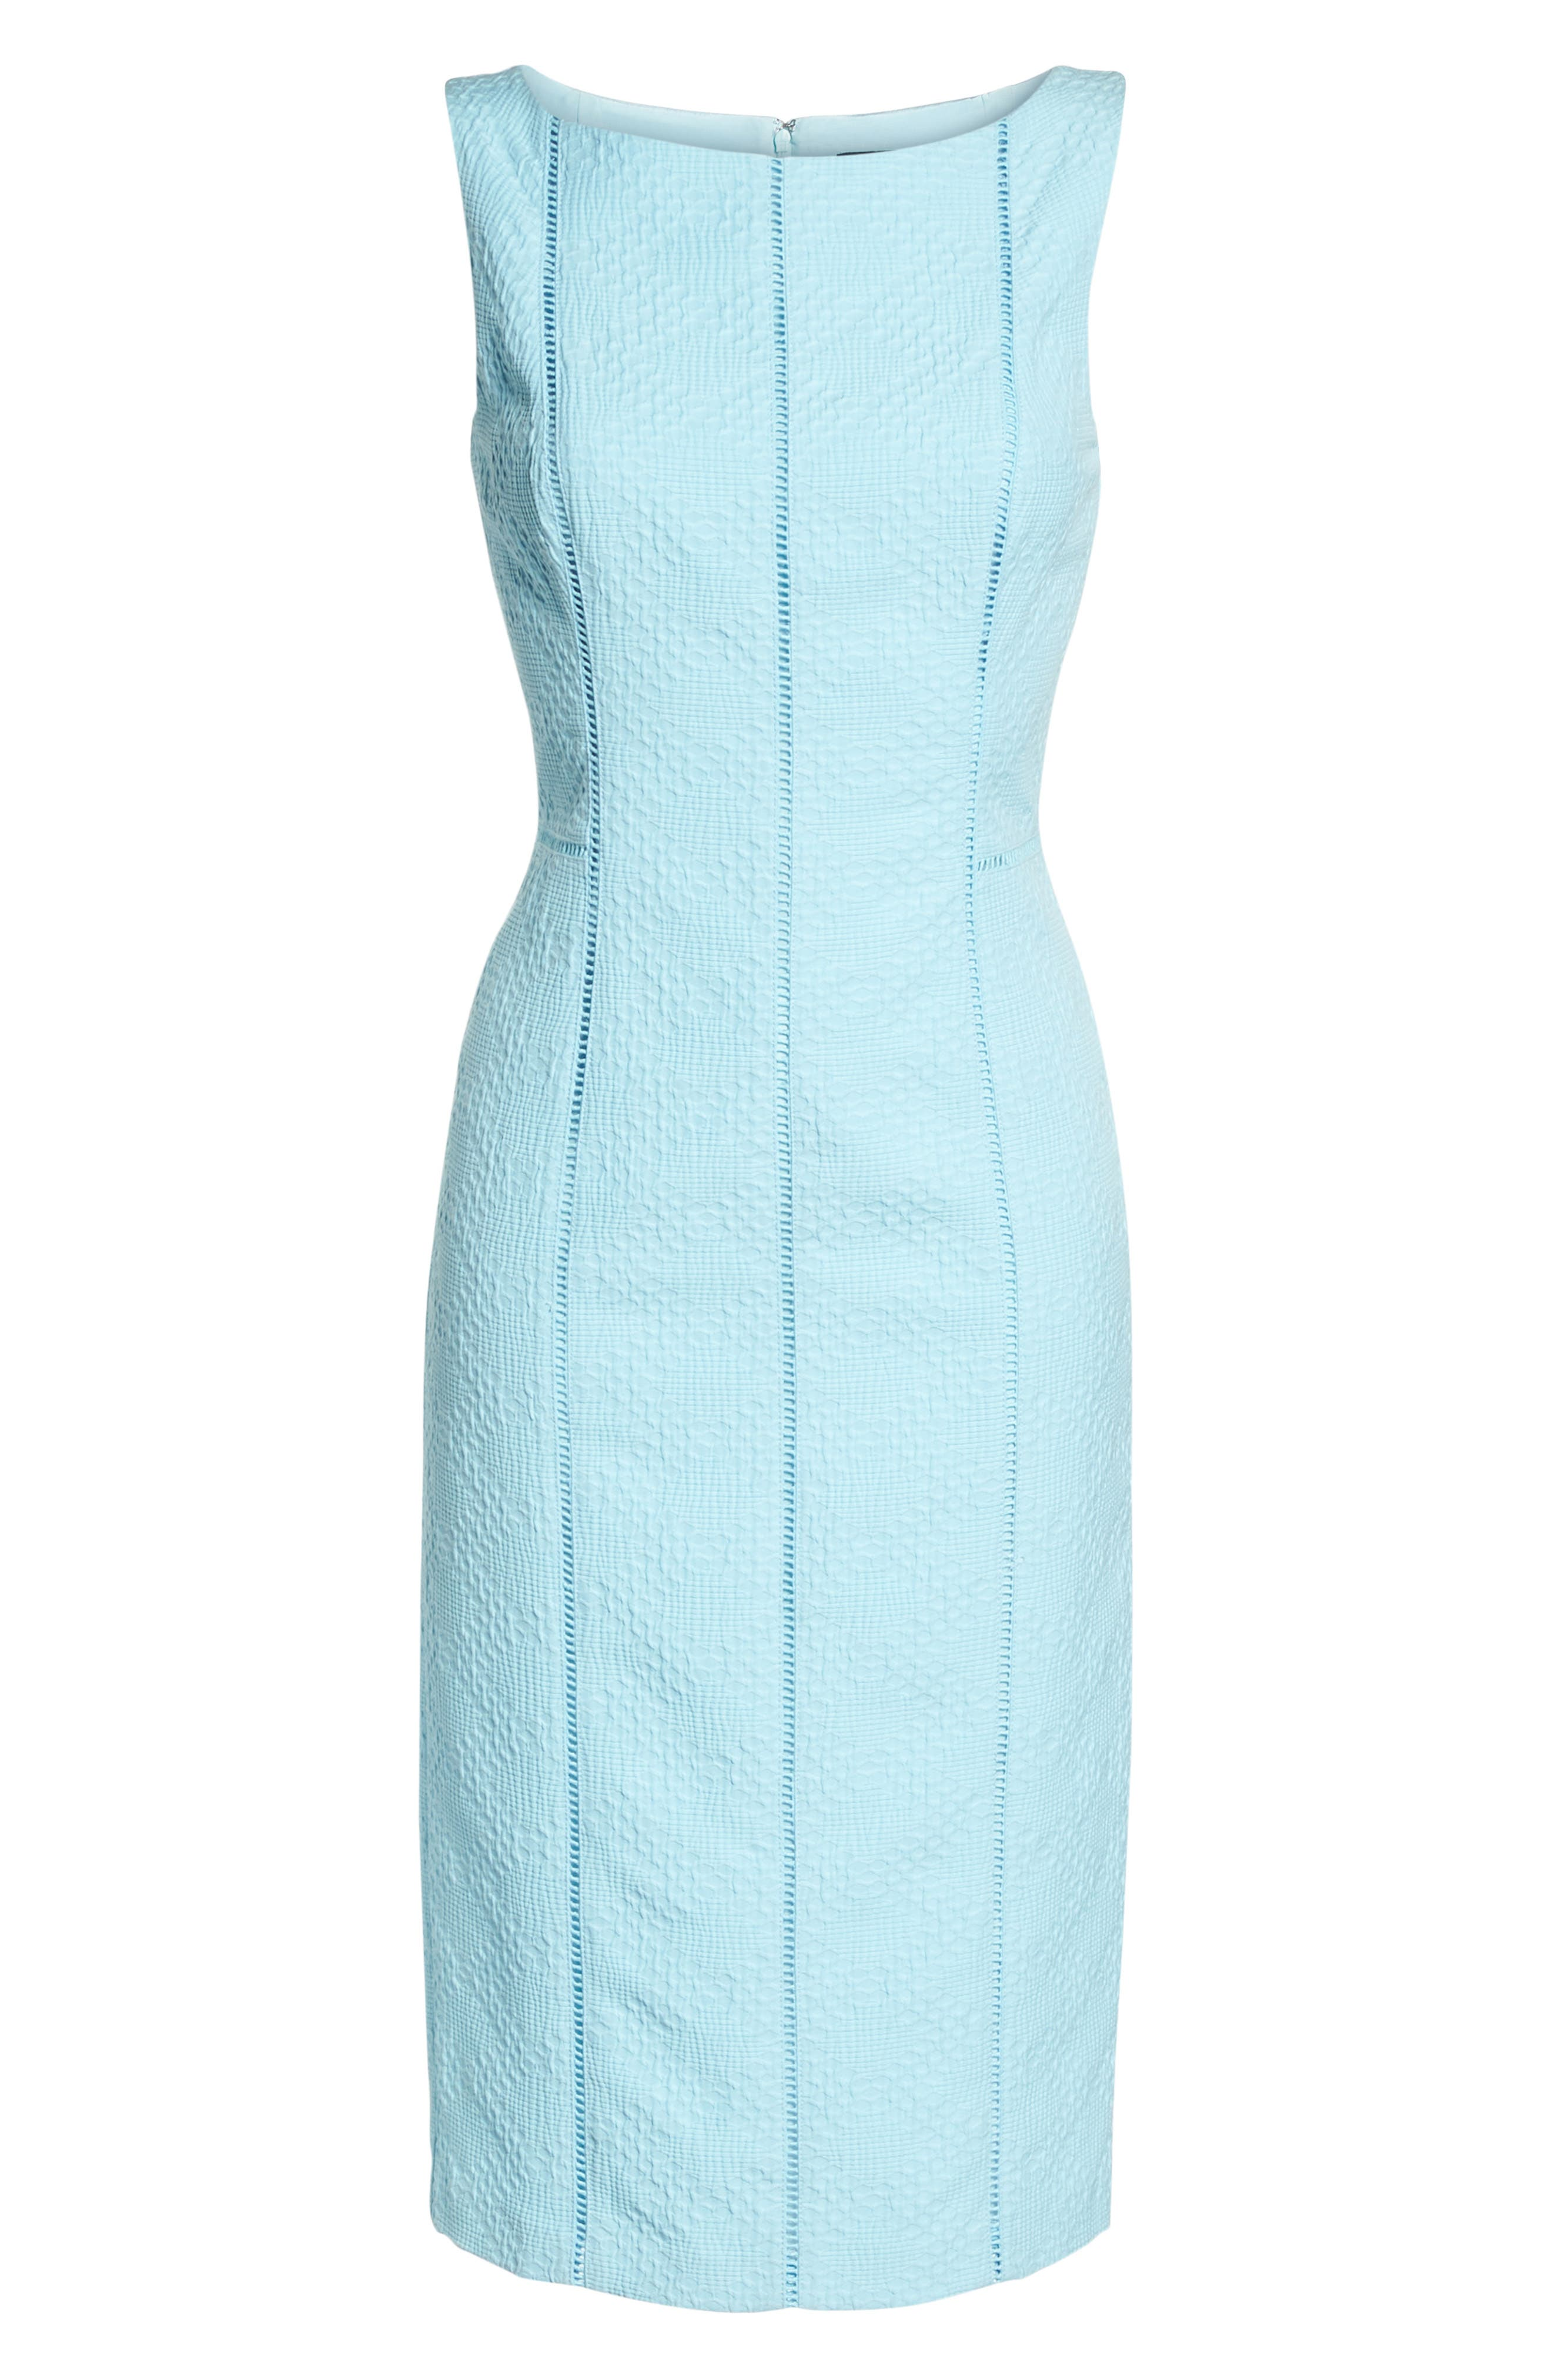 Stretch Pique Sheath Dress,                             Alternate thumbnail 7, color,                             Blue